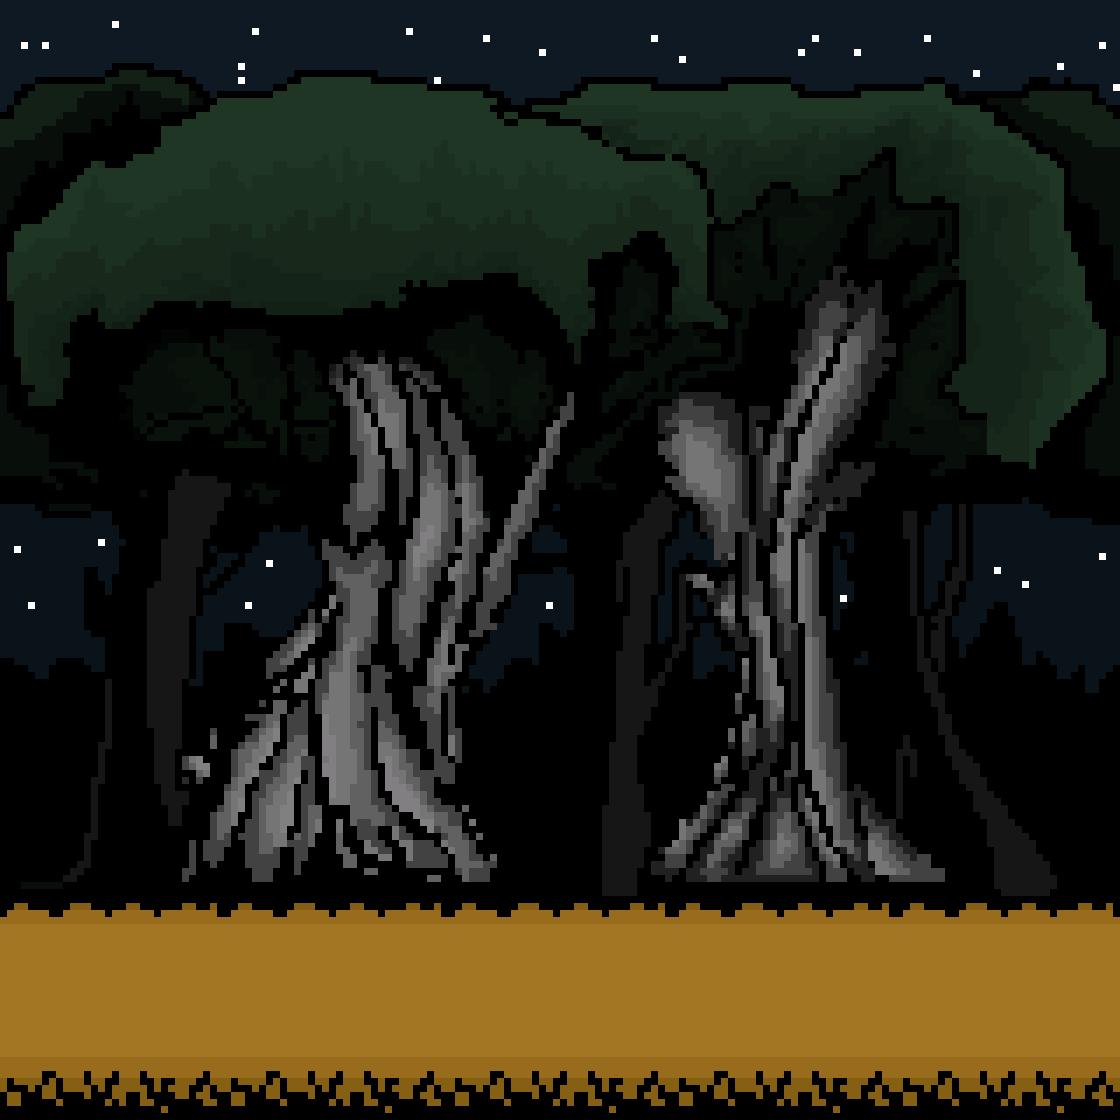 forest scene by anjaliashok01